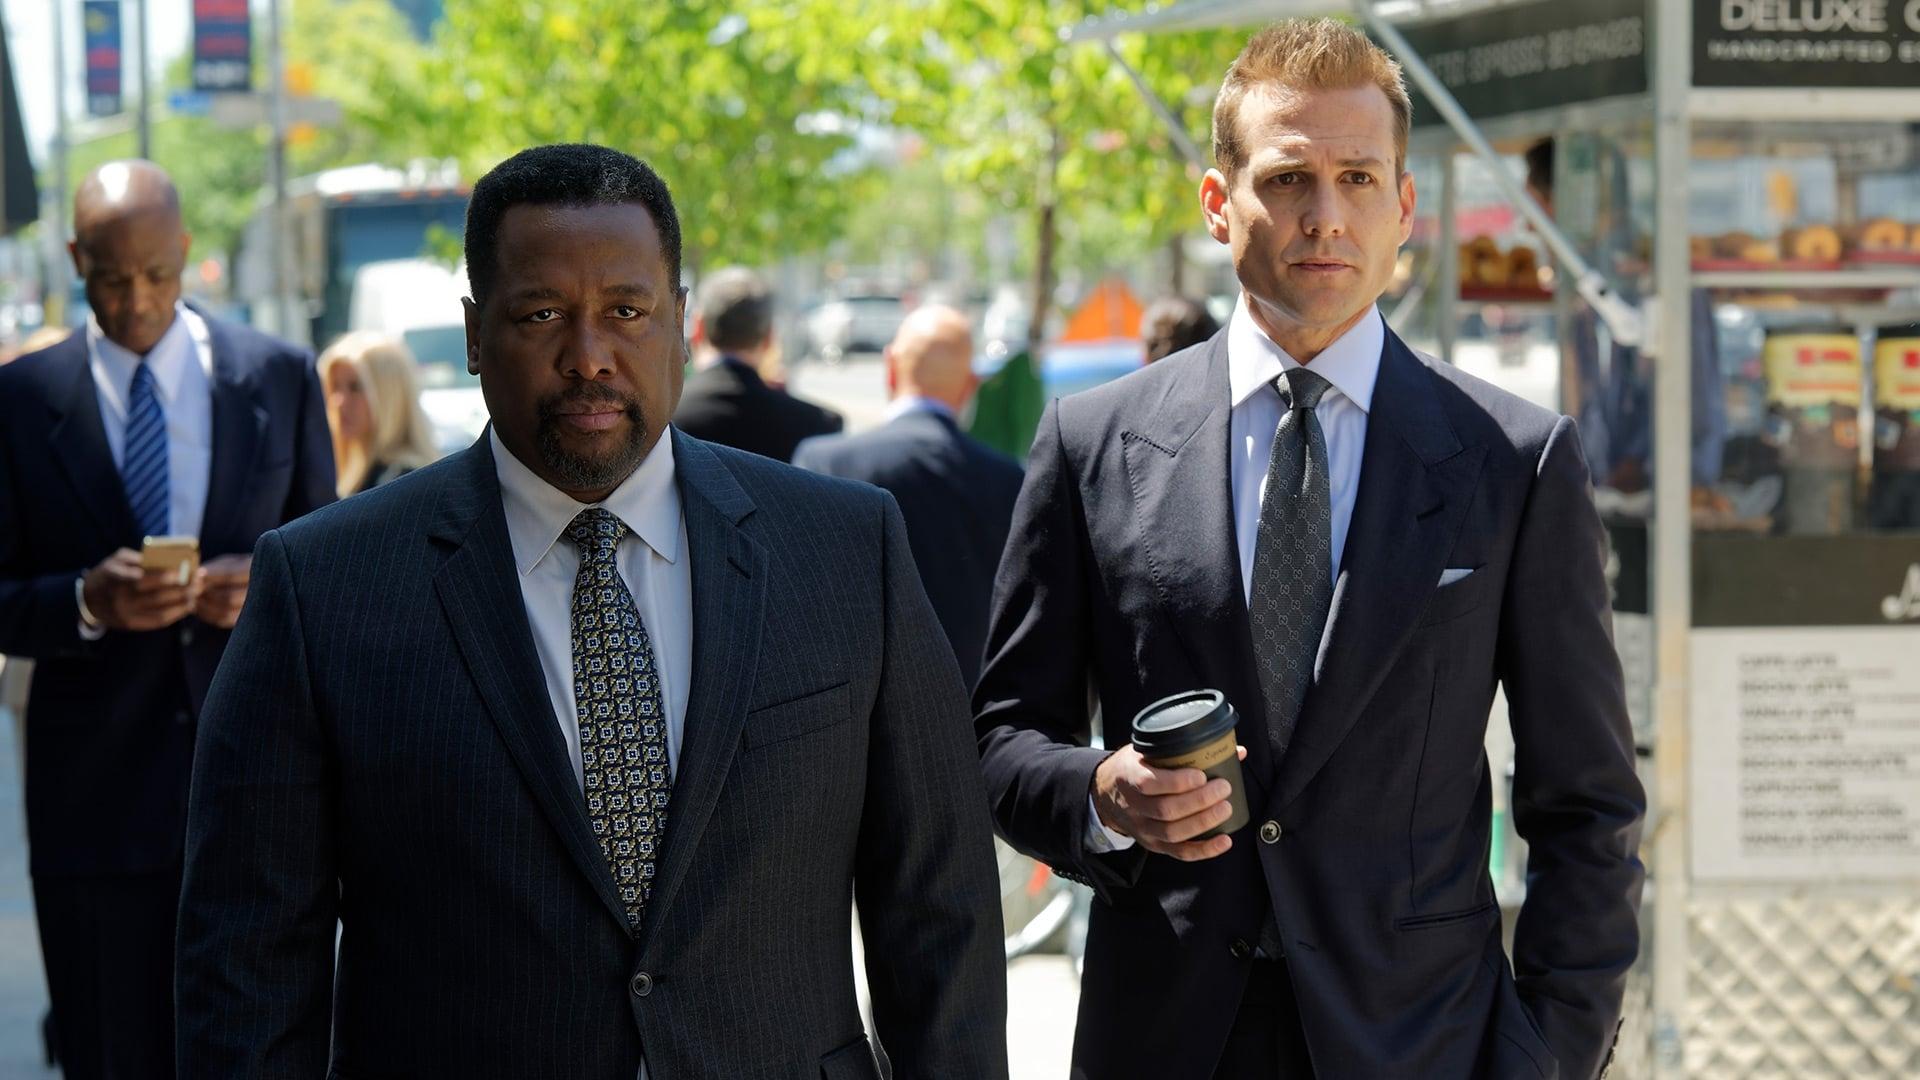 Suits - Season 8 Episode 10 : Managing Partner